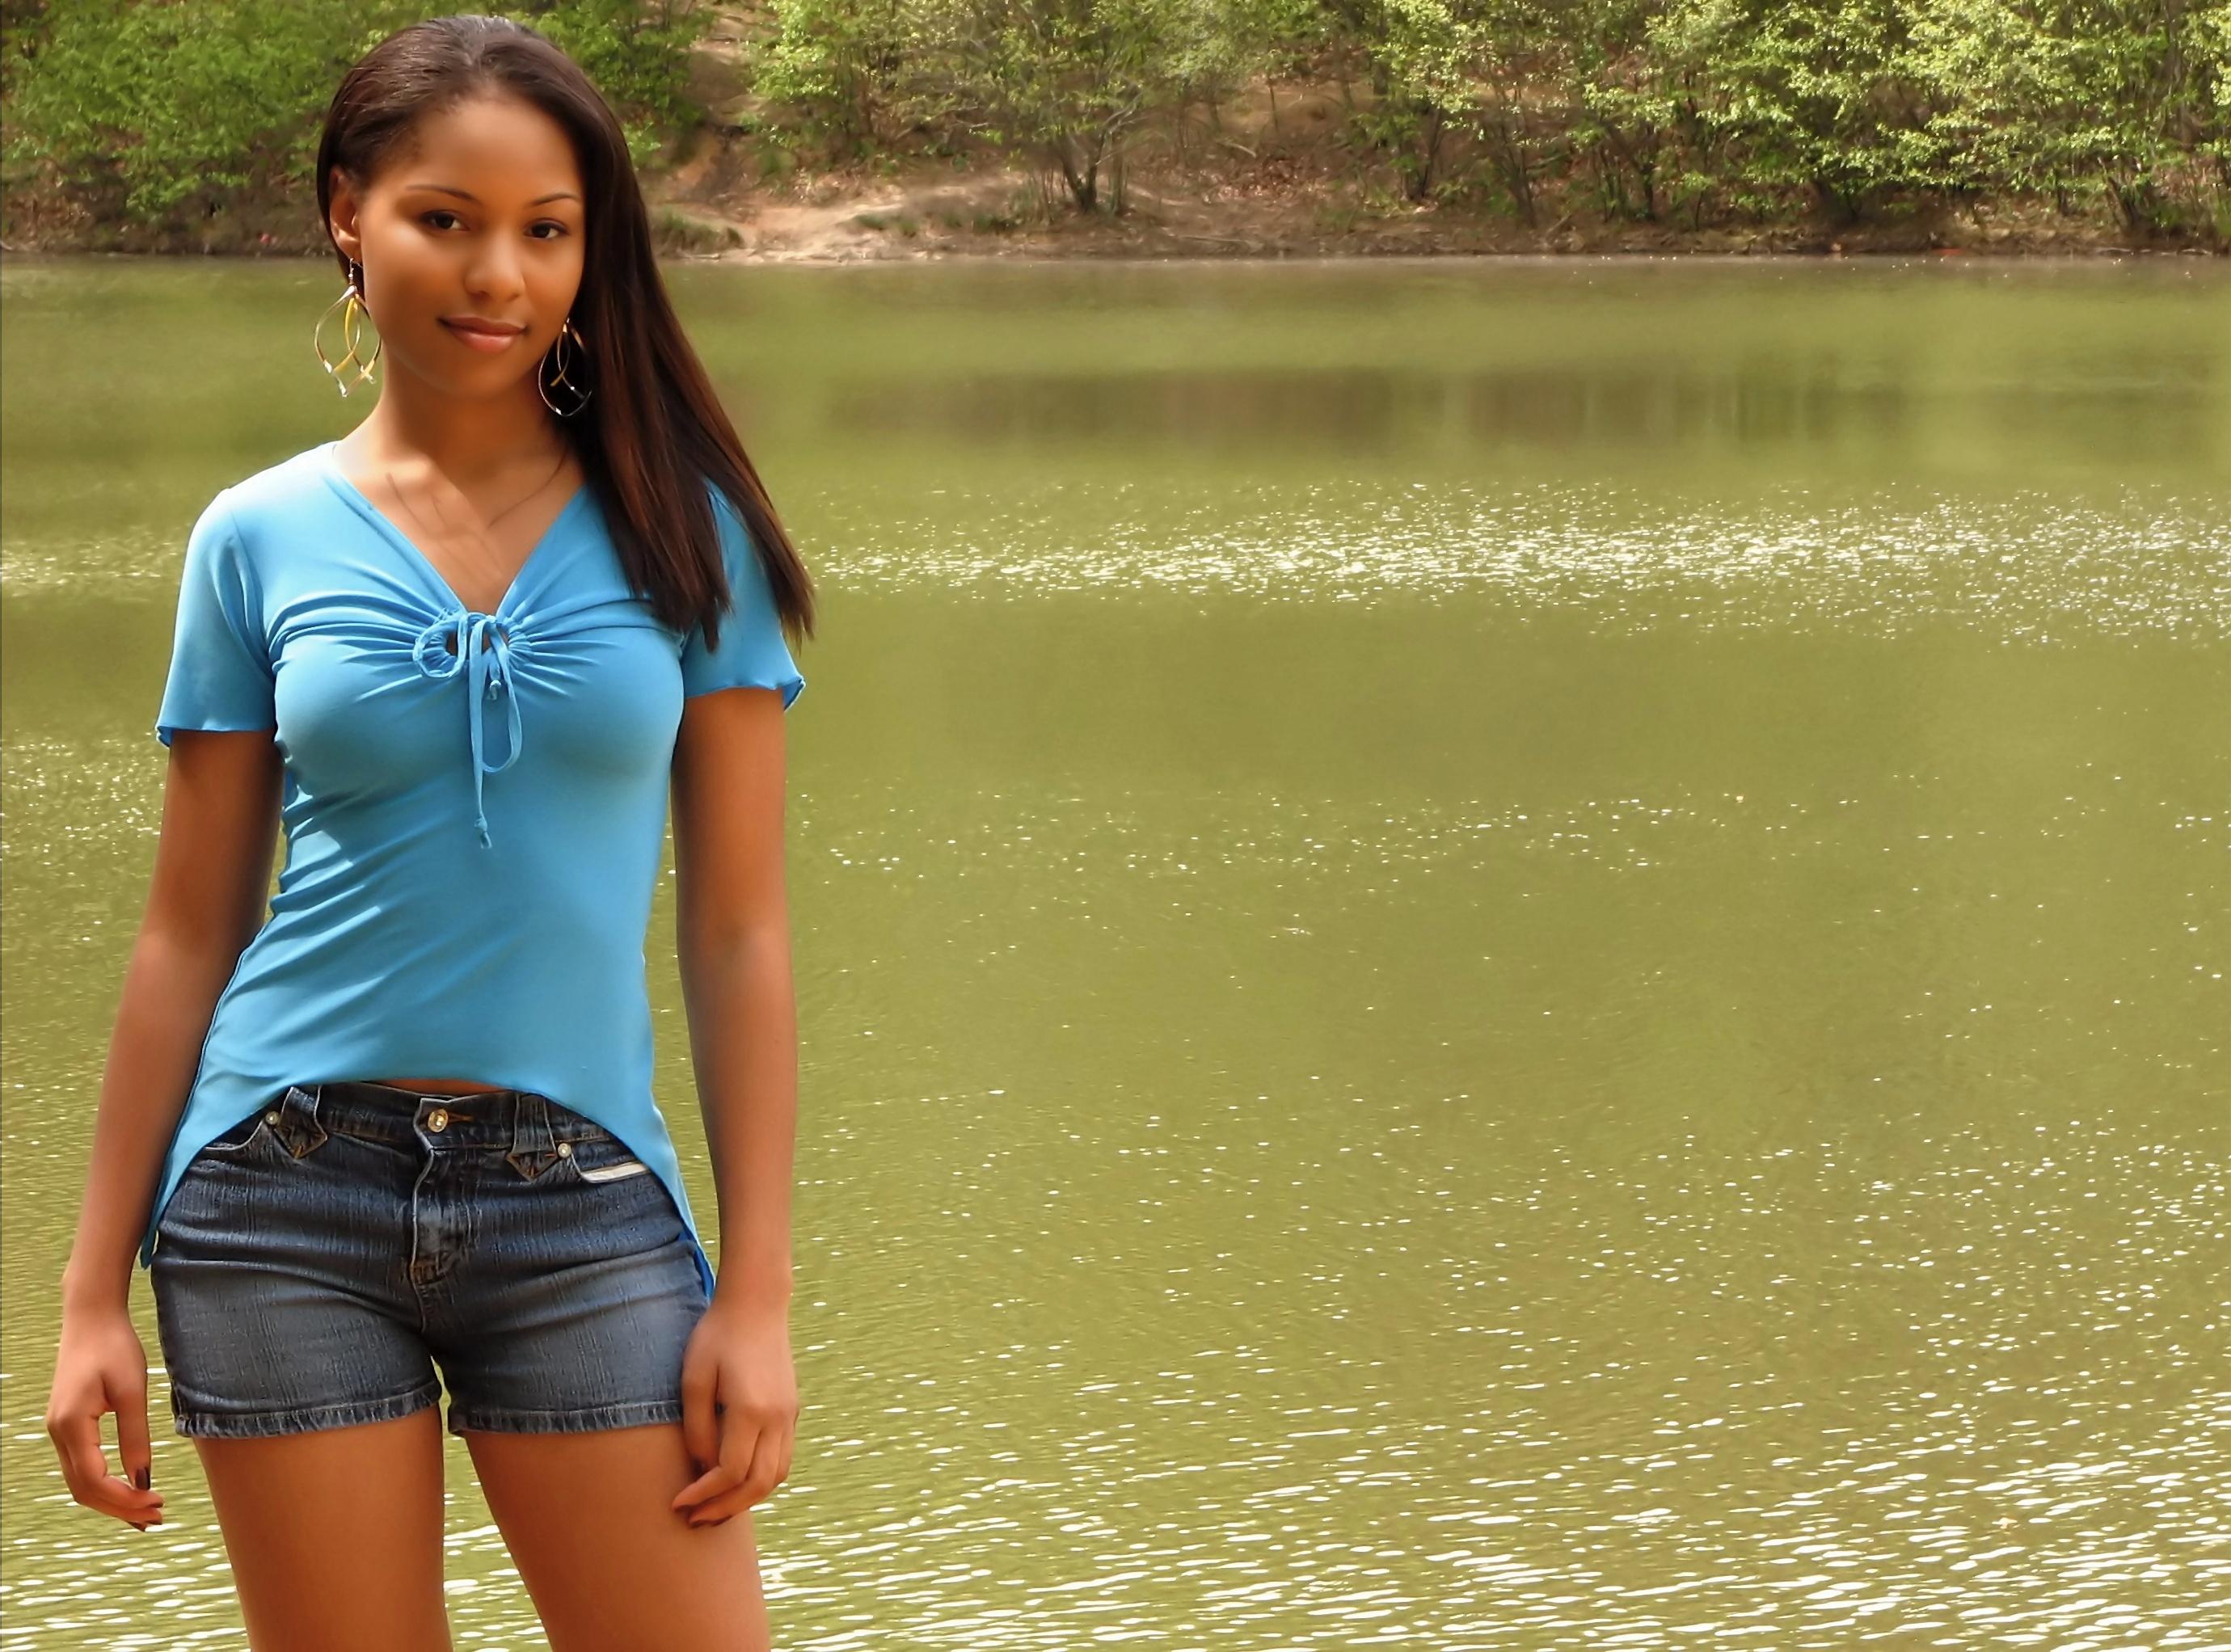 A beautiful African American teen girl, AfricanAmerican, Beautiful, Girls, Girls photos, HQ Photo